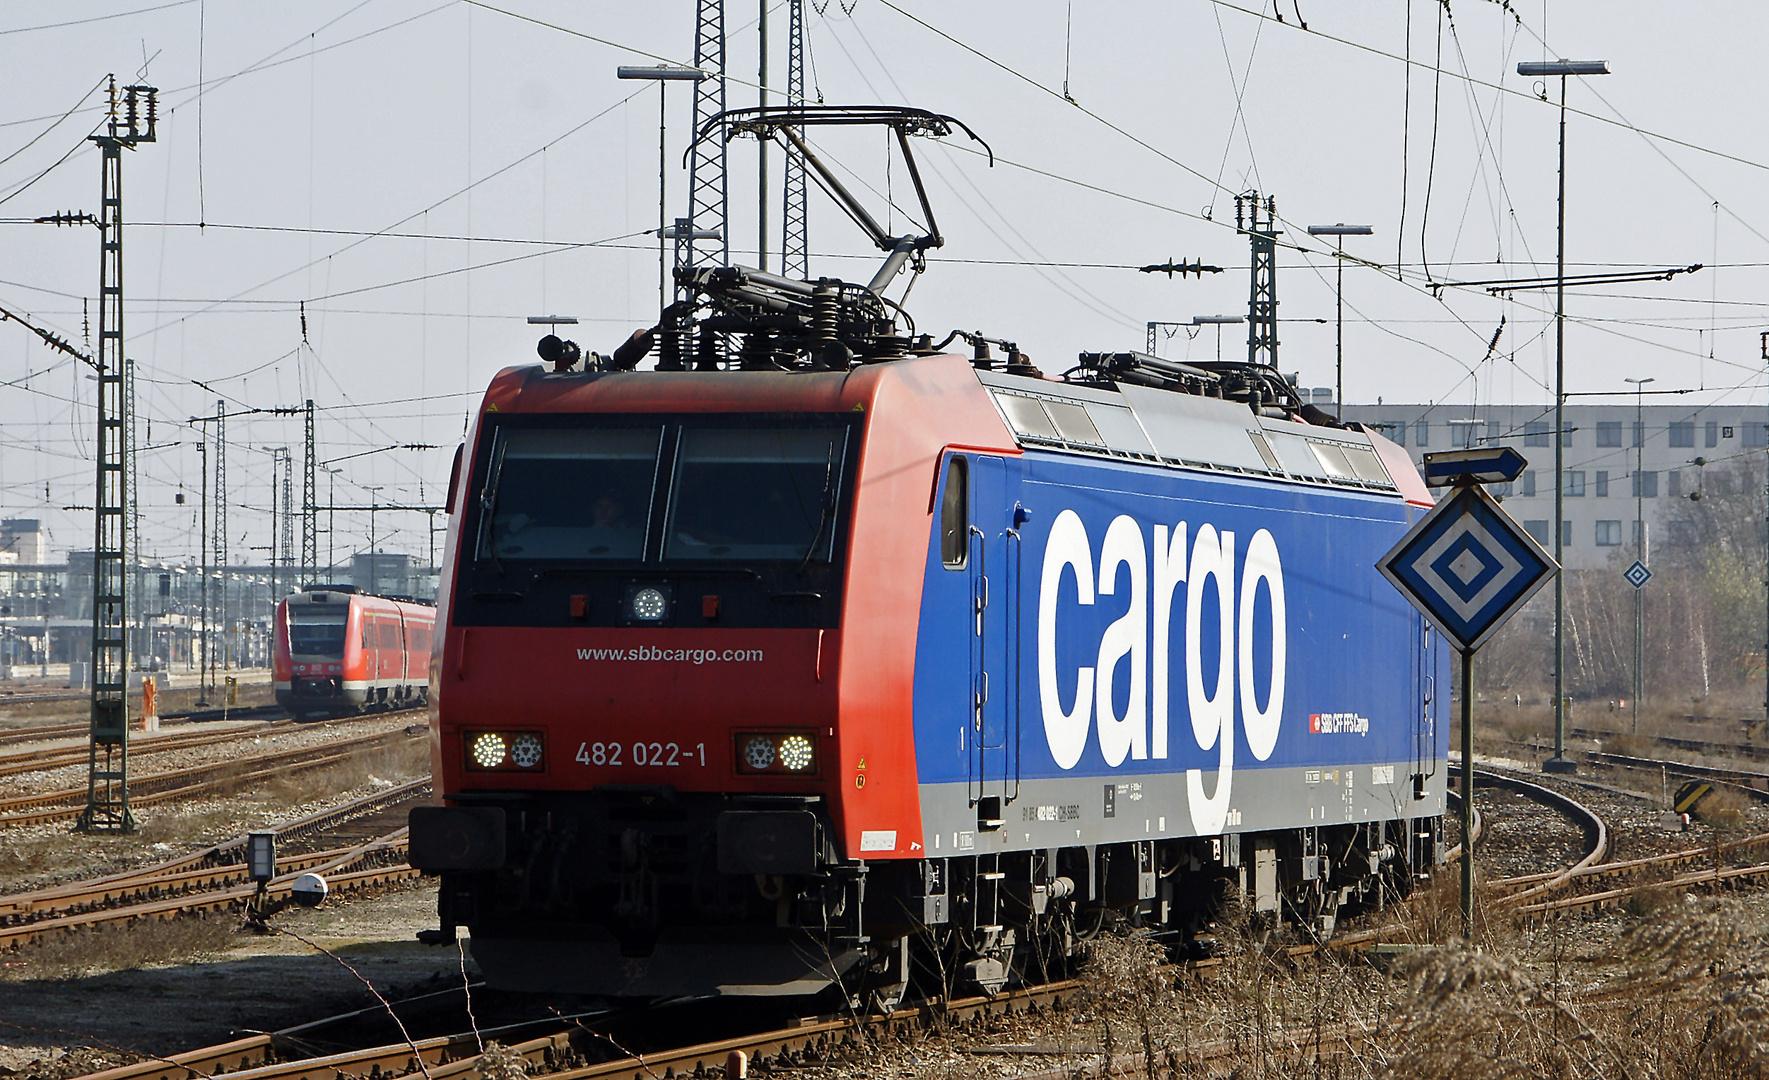 SBB Cargo Re 482